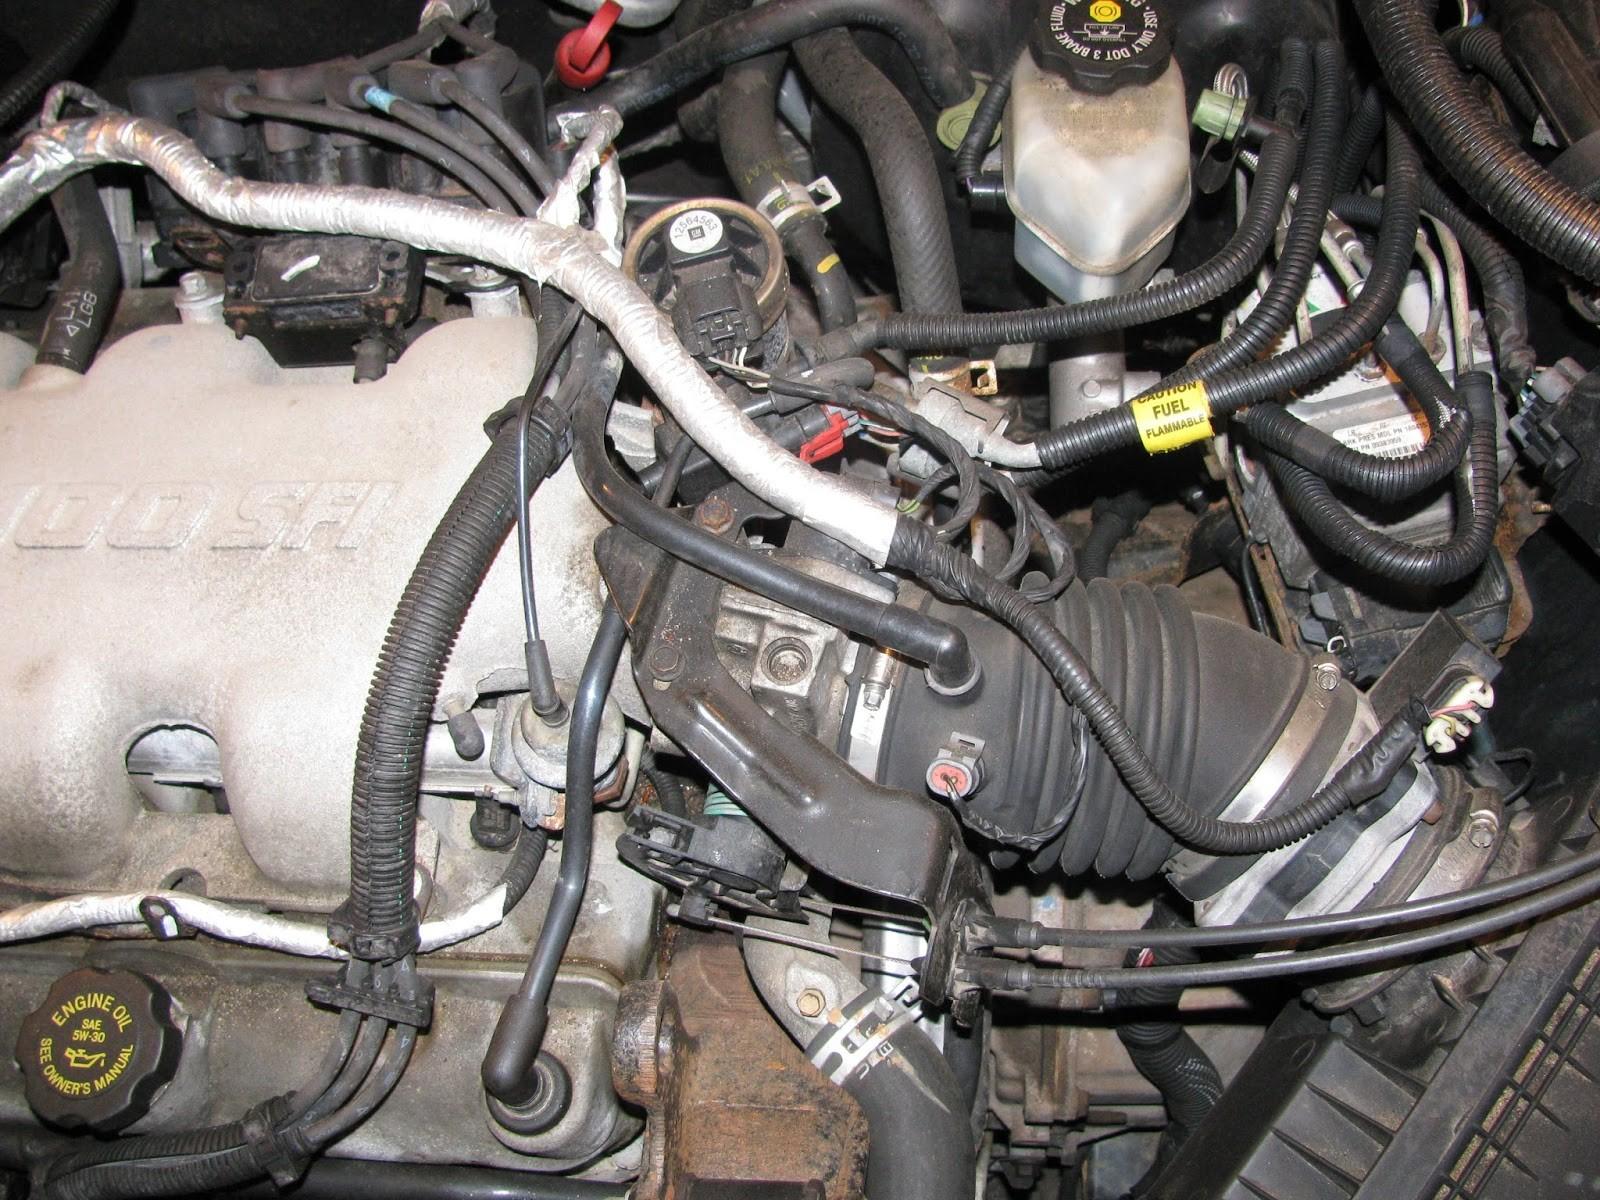 3 1 Liter V6 Engine Diagram the original Mechanic 3 1l Engine Gm Replacing Intake Manifold Of 3 1 Liter V6 Engine Diagram